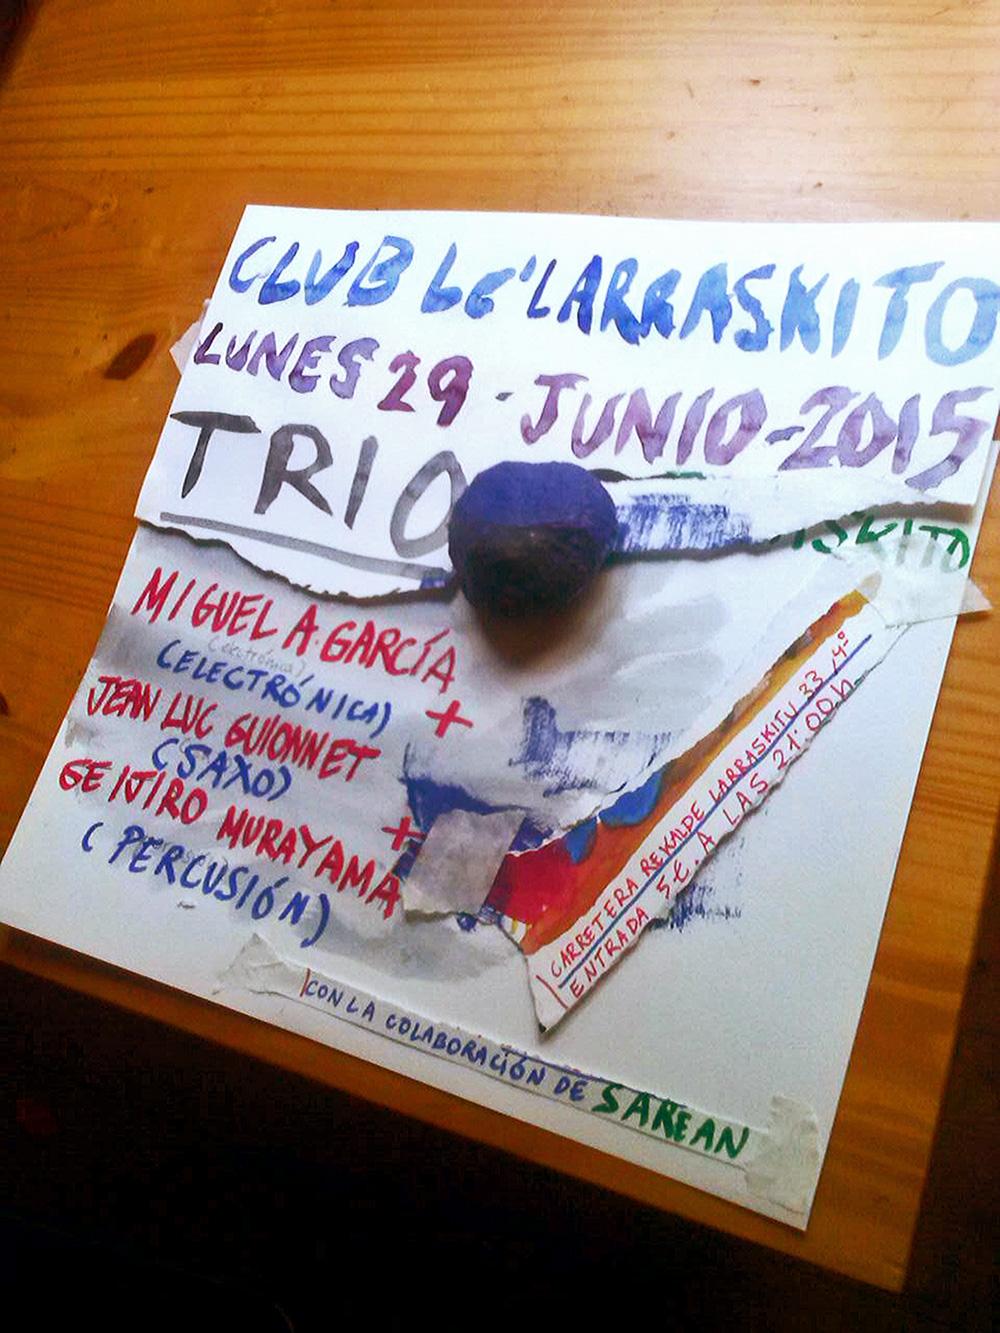 150629-clublarraskito_cartel_por_elena_aizkoa